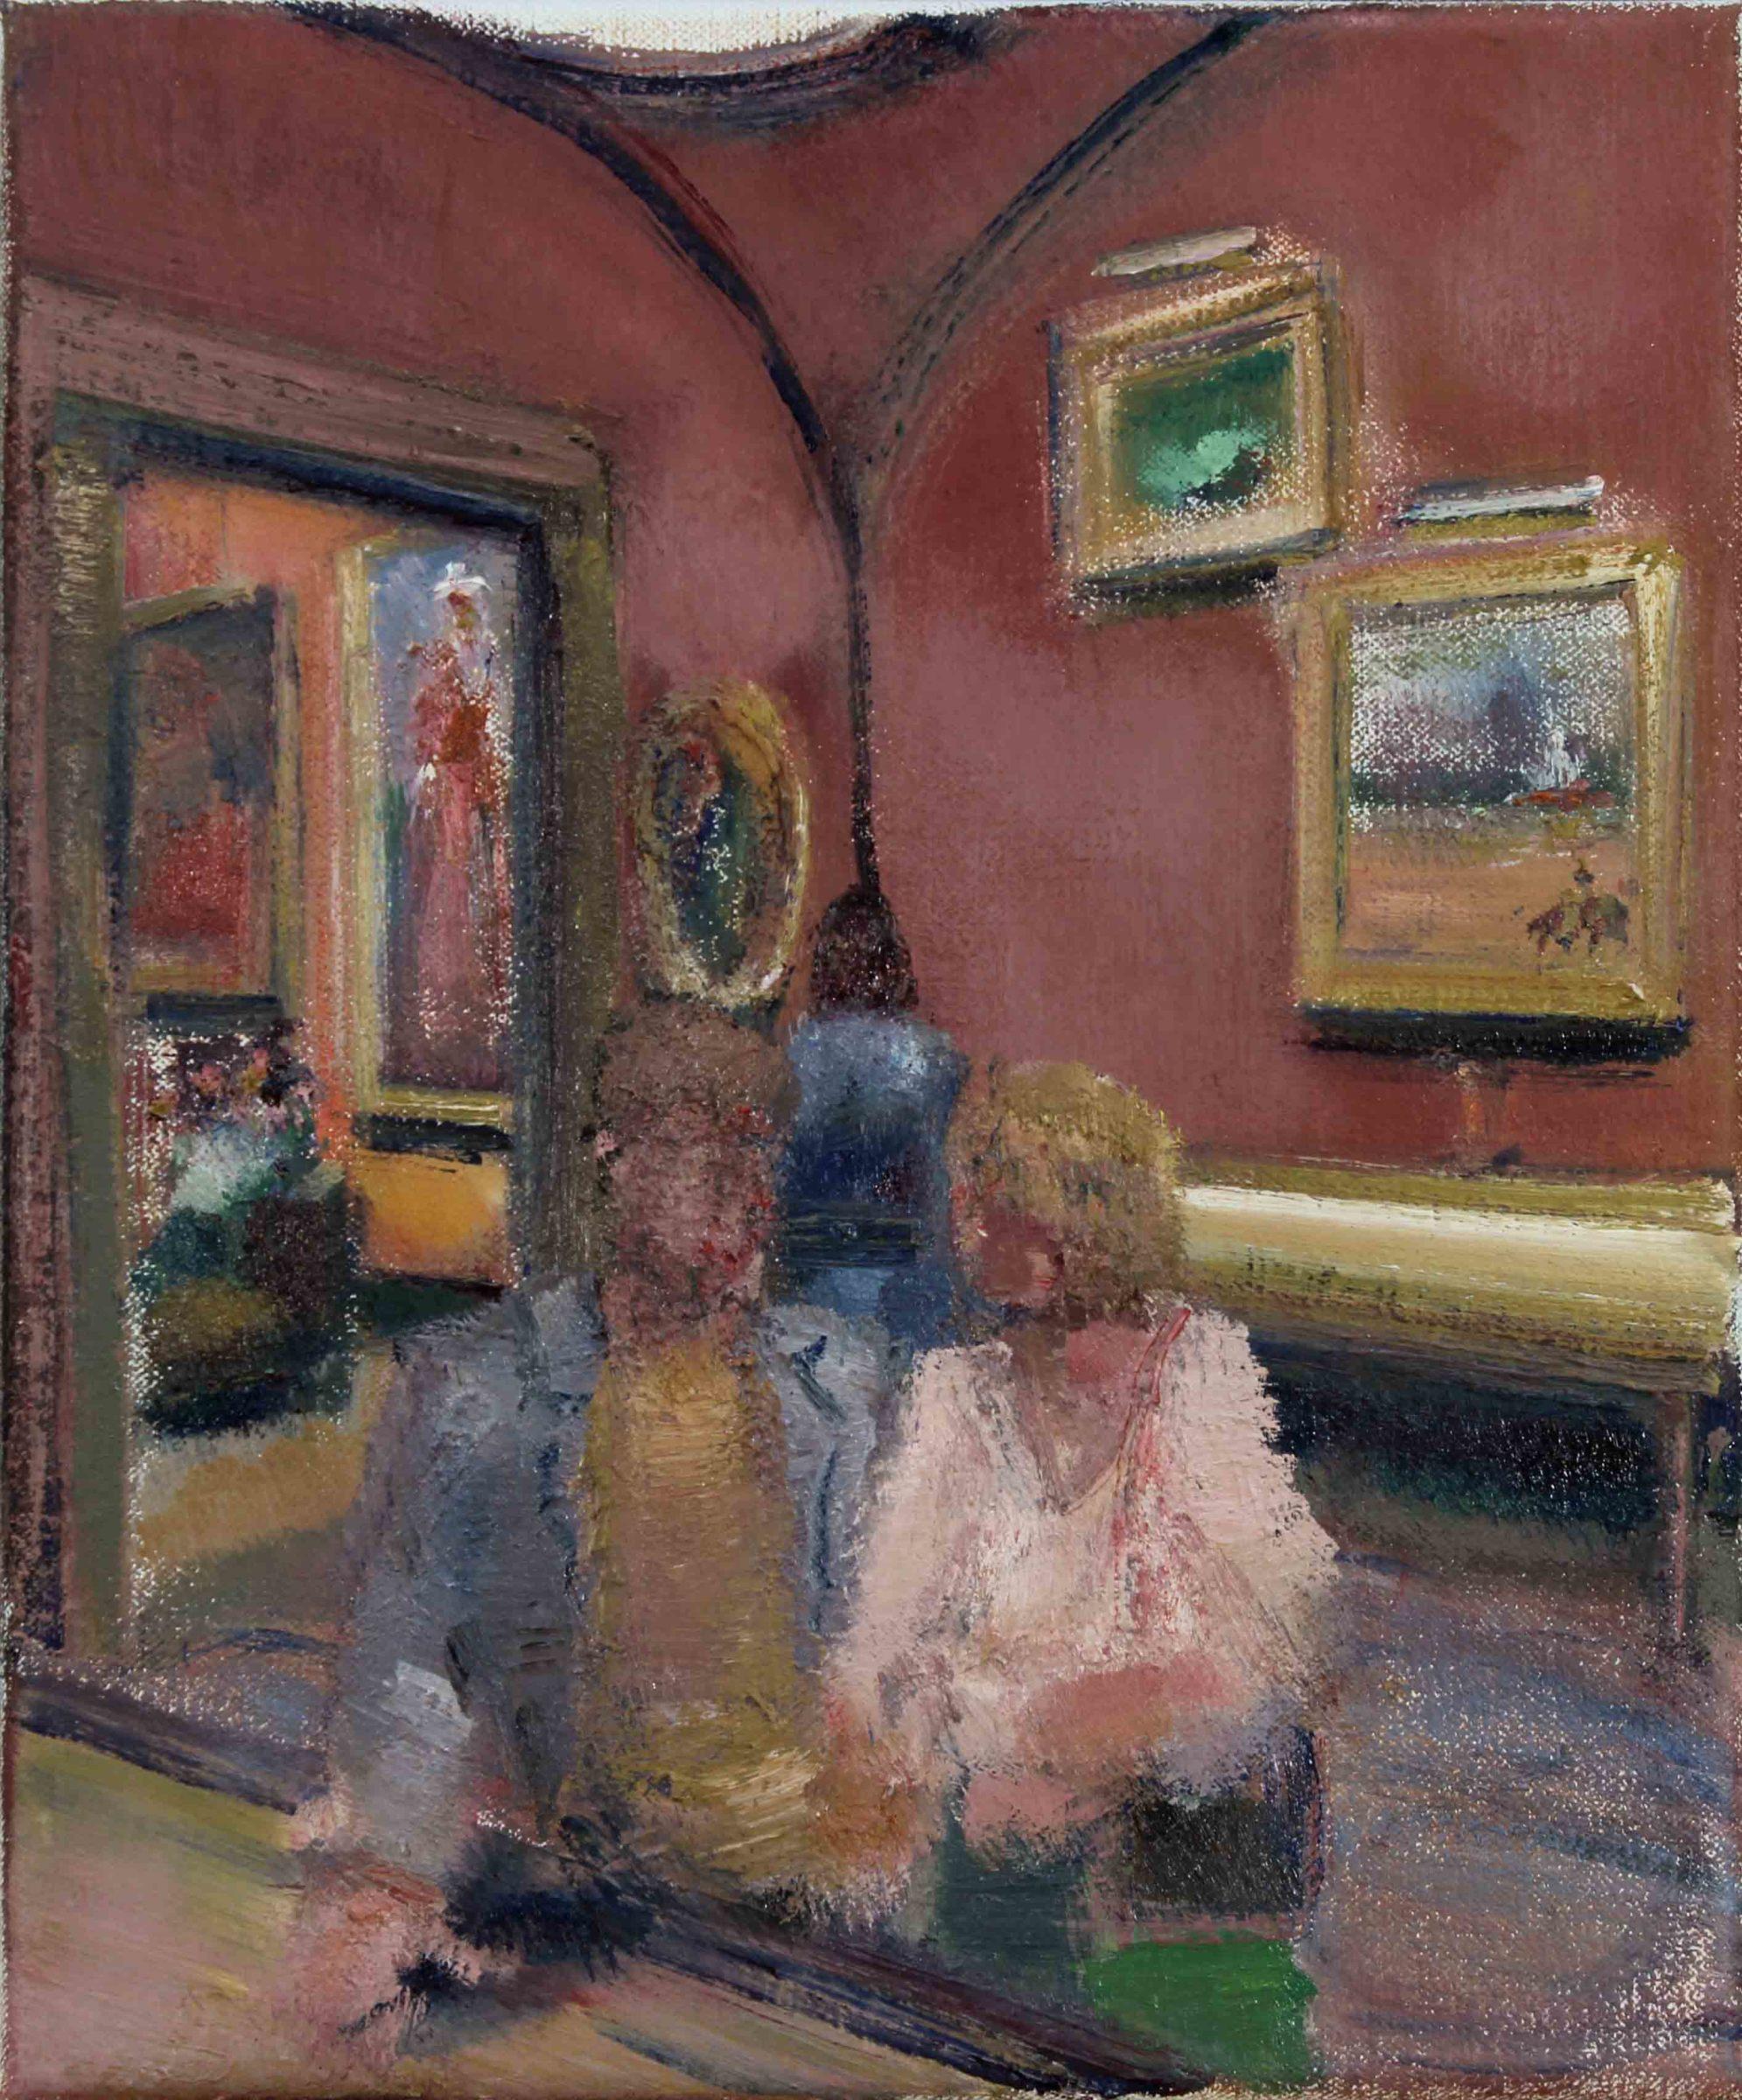 "<span class=""link fancybox-details-link""><a href=""/artists/59-simon-nicholas/works/542-simon-nicholas-kenwood-i/"">View Detail Page</a></span>Simon Nicholas   Kenwood I   Oil on Linen   12.5 x 10 inches  SOLD"